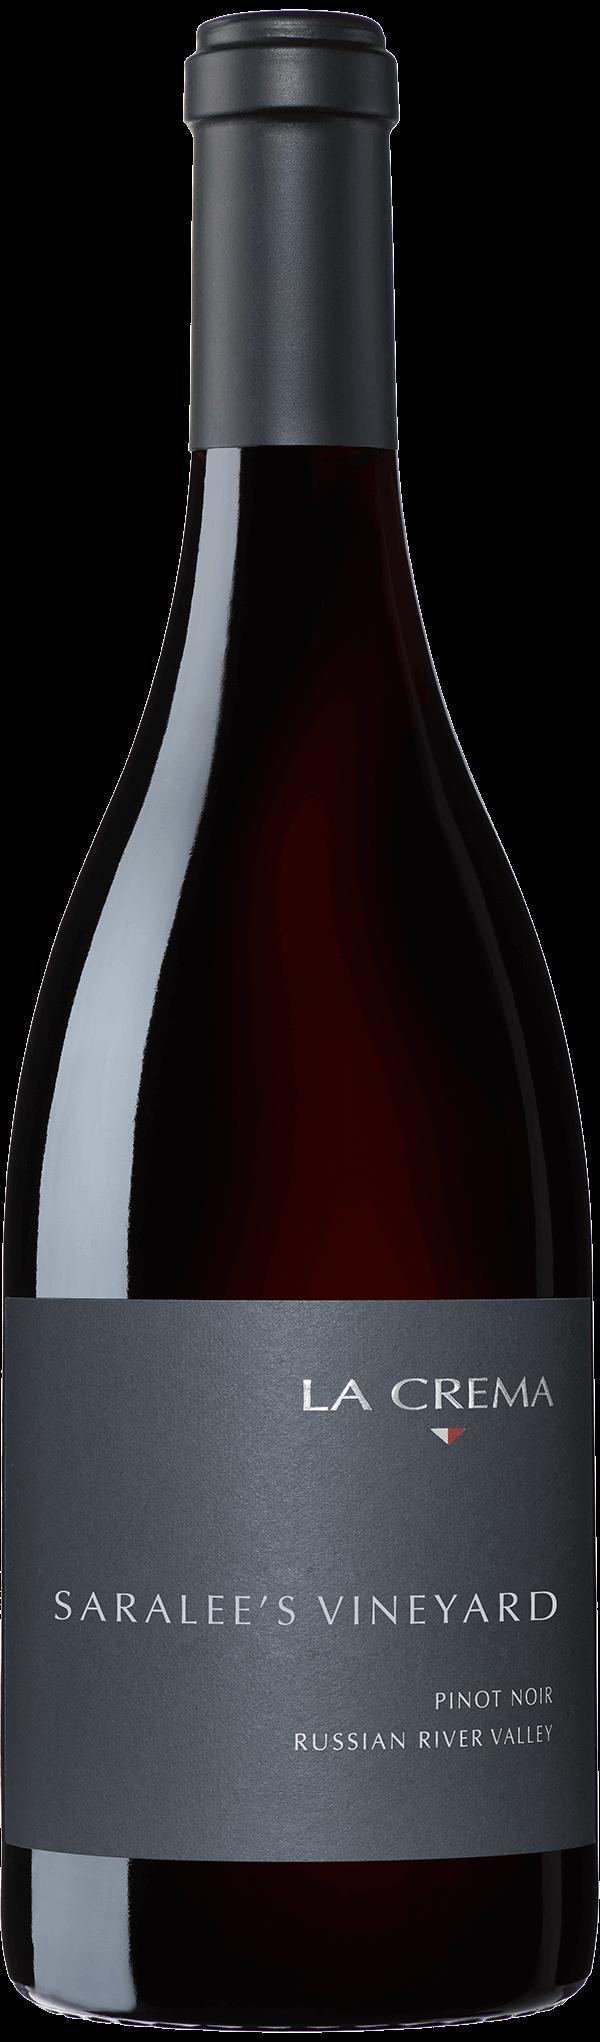 2017 Saralee's Vineyard Pinot Noir